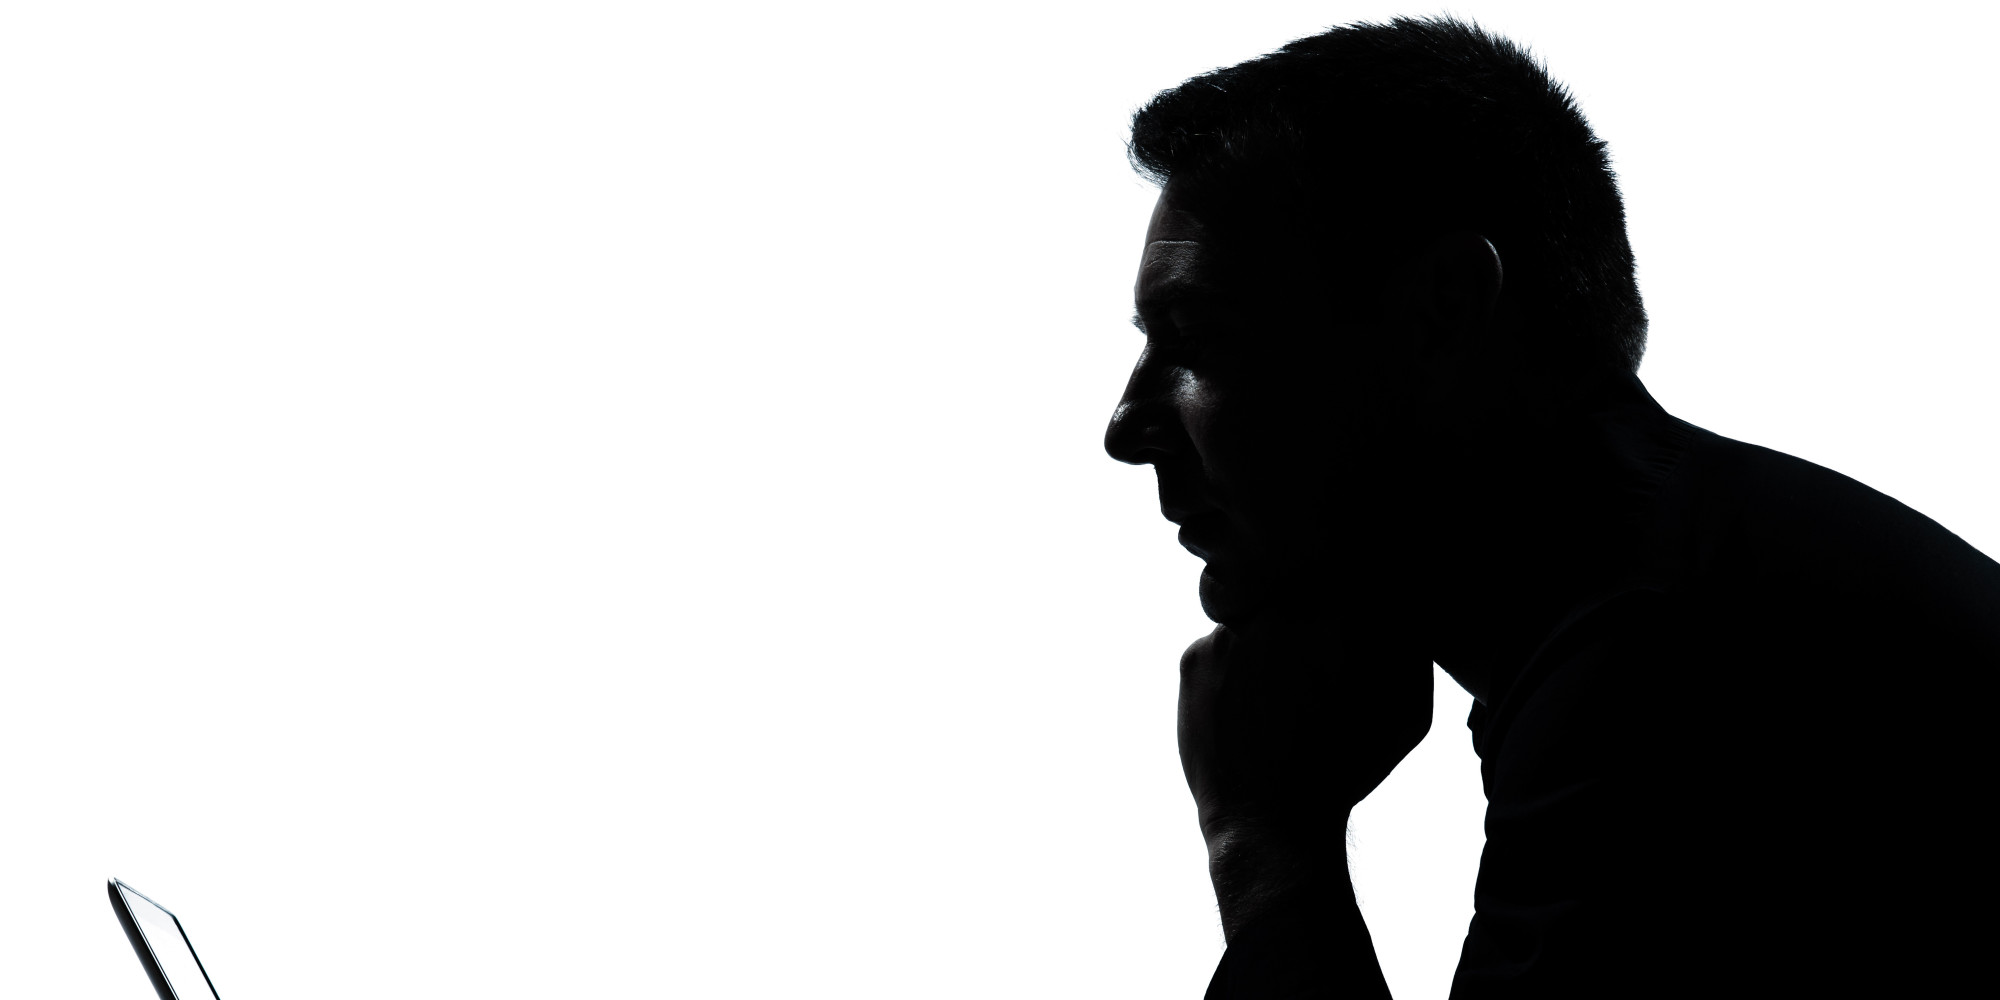 Man Thinking Silhouette.